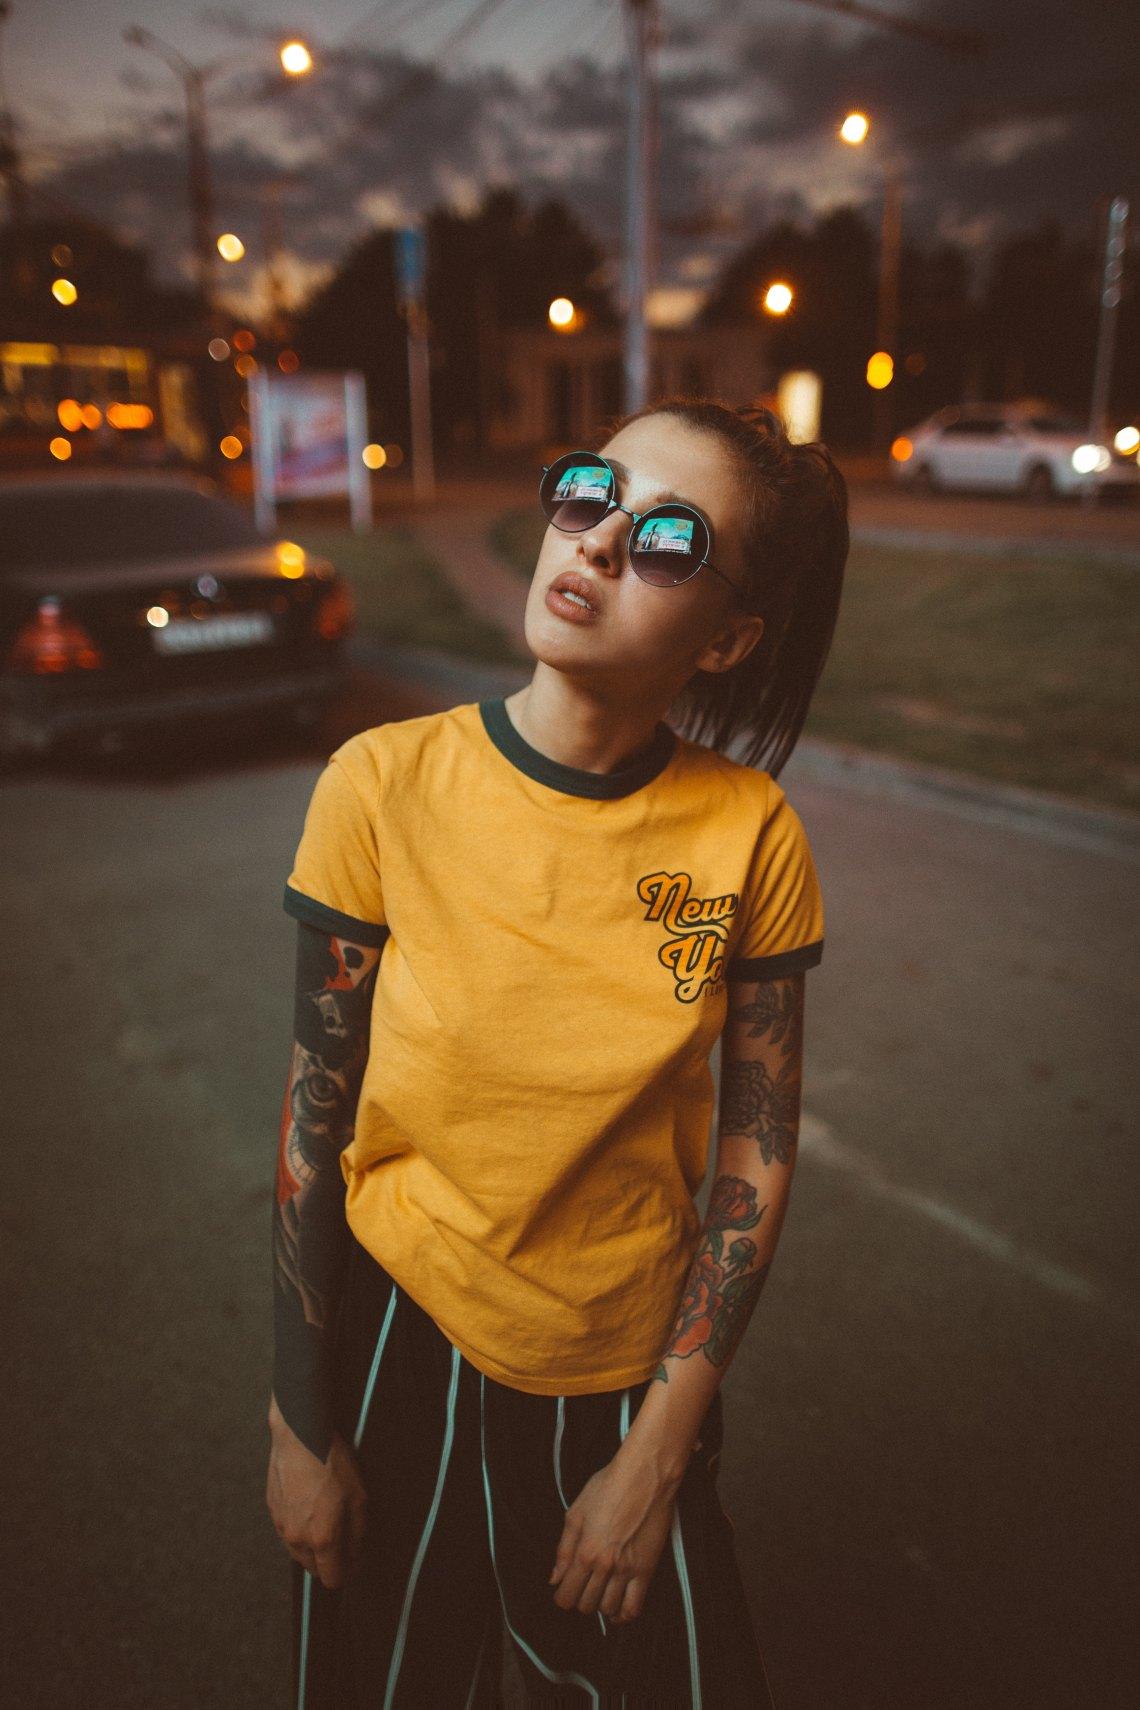 girl in a yellow shirt